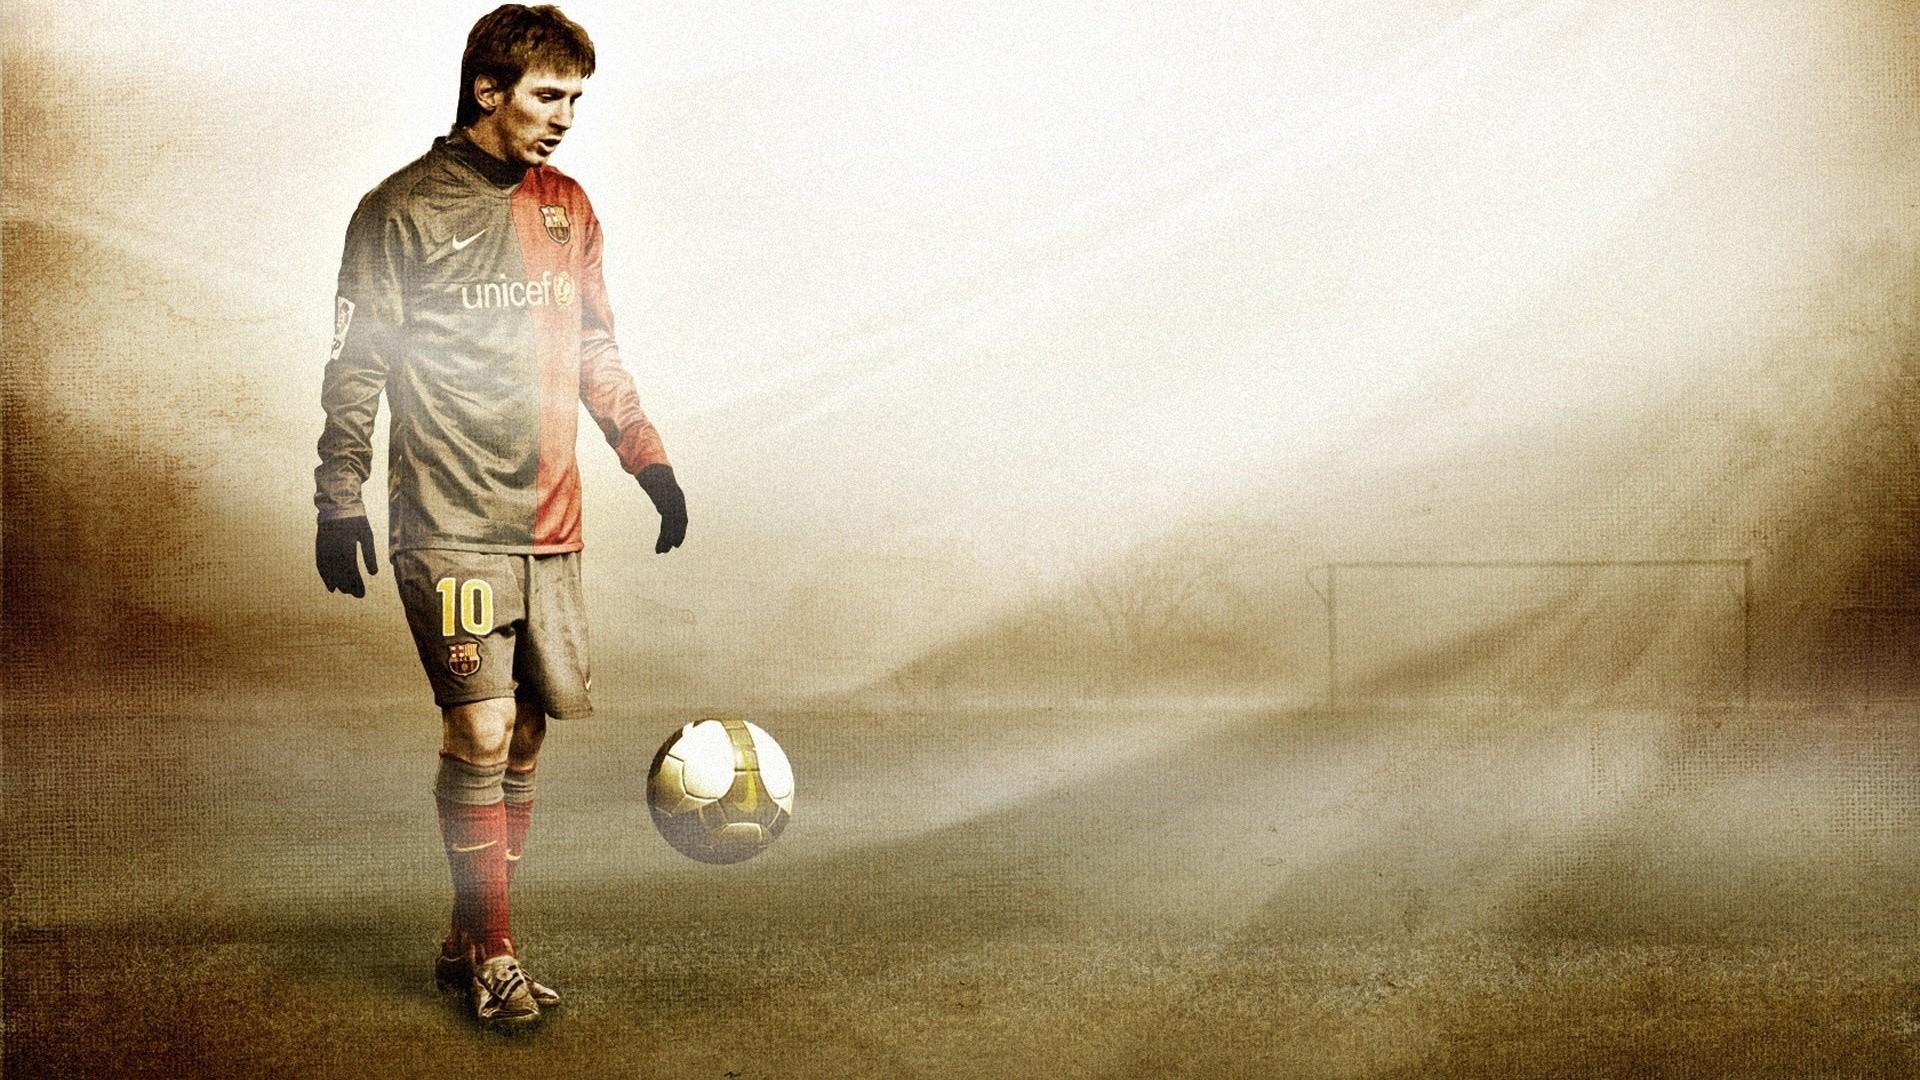 … Background Full HD 1080p. Wallpaper lionel messi, football,  ball, field, gate, footballer